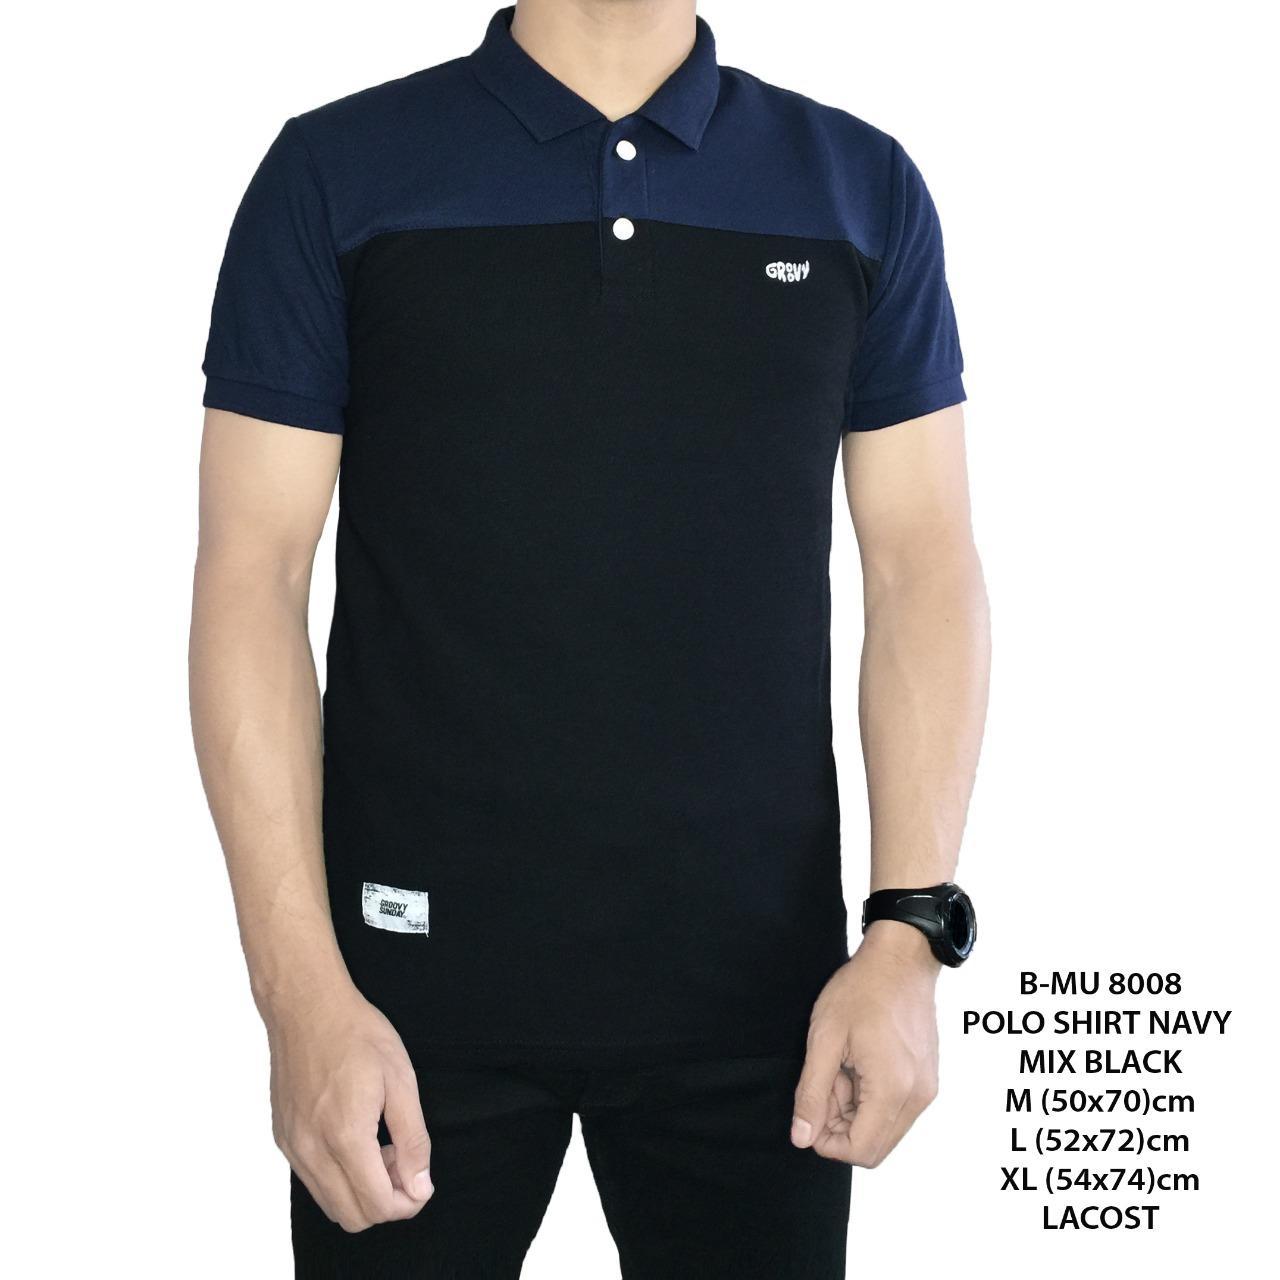 Kelebihan Bajuku Murah Polo Shirt Floral Printing Kaos Pria Tangan Lengan Pendek Cabanna Black Navy Mix Best Seller